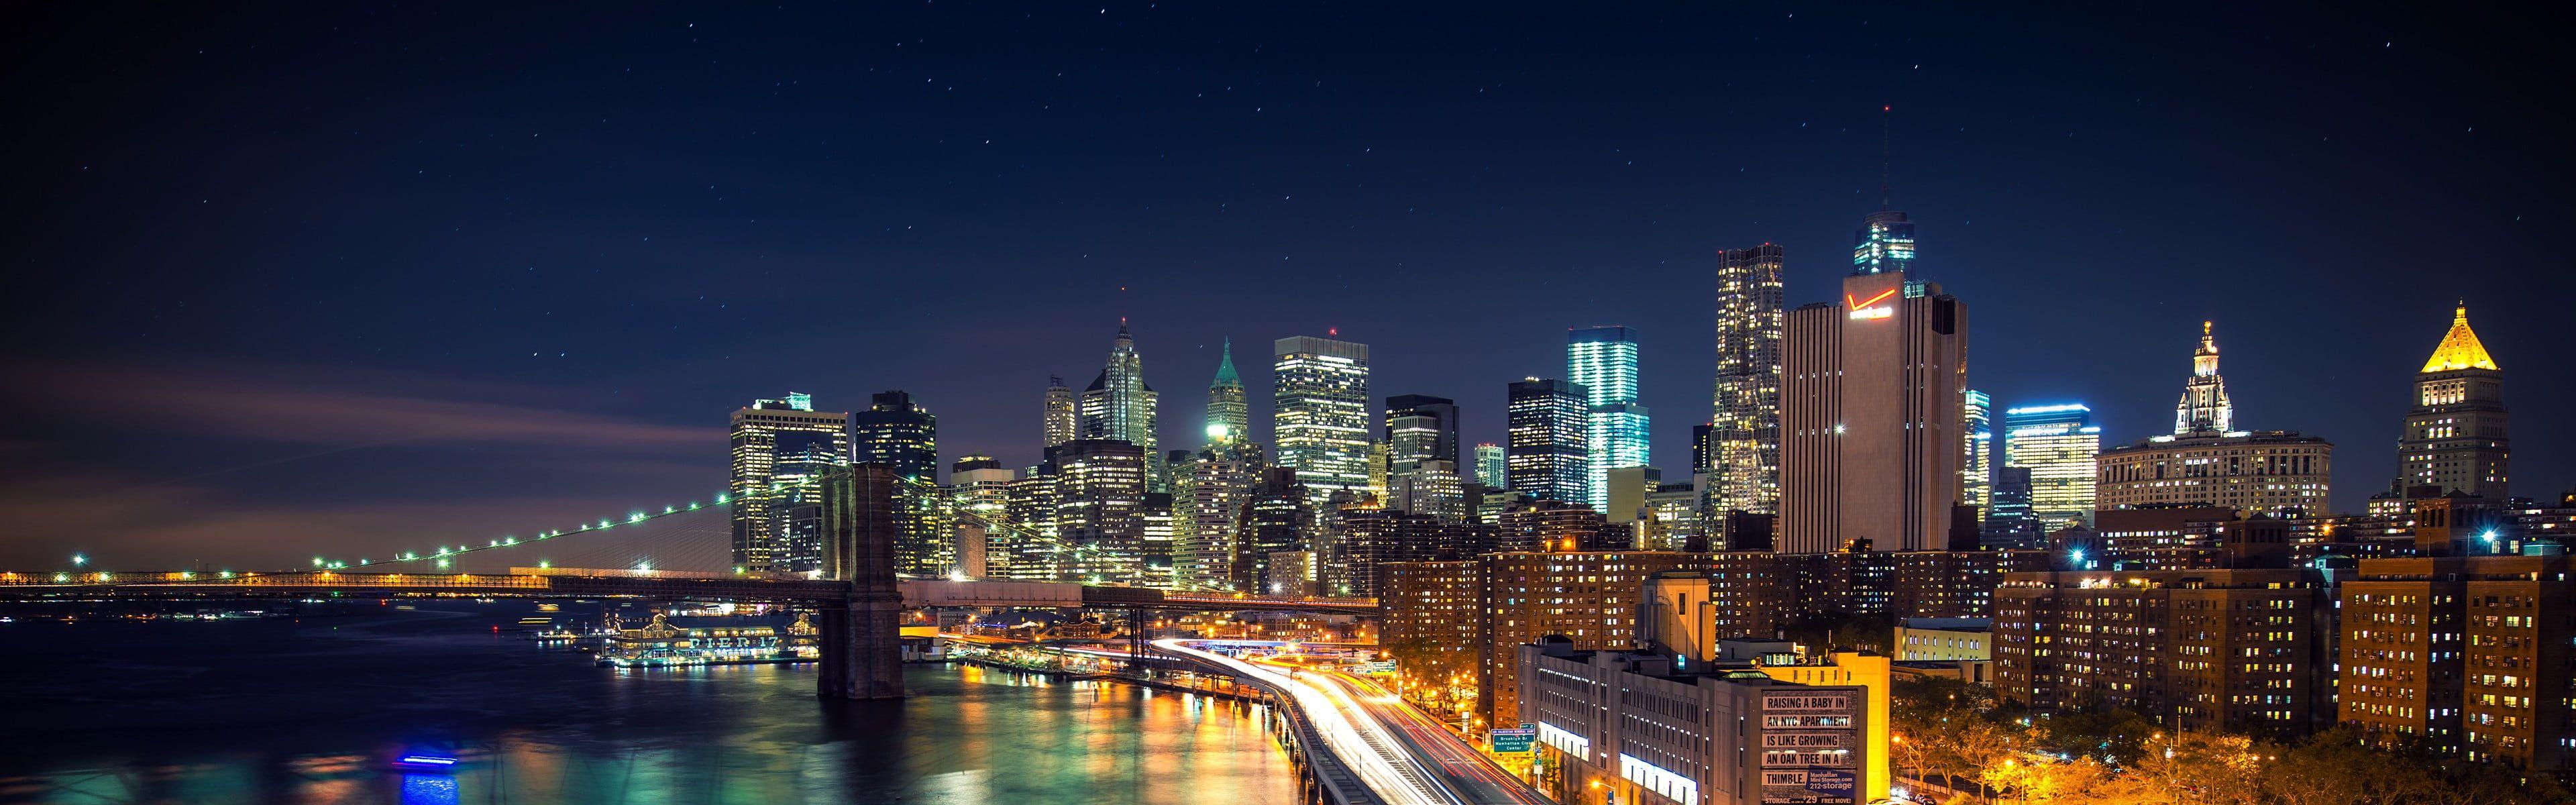 City Skyline New York City City Night Lights Long Exposure Brooklyn Bridge Multiple Display Dual Monitors 4k Wallpape City Skyline Skyline Brooklyn Bridge